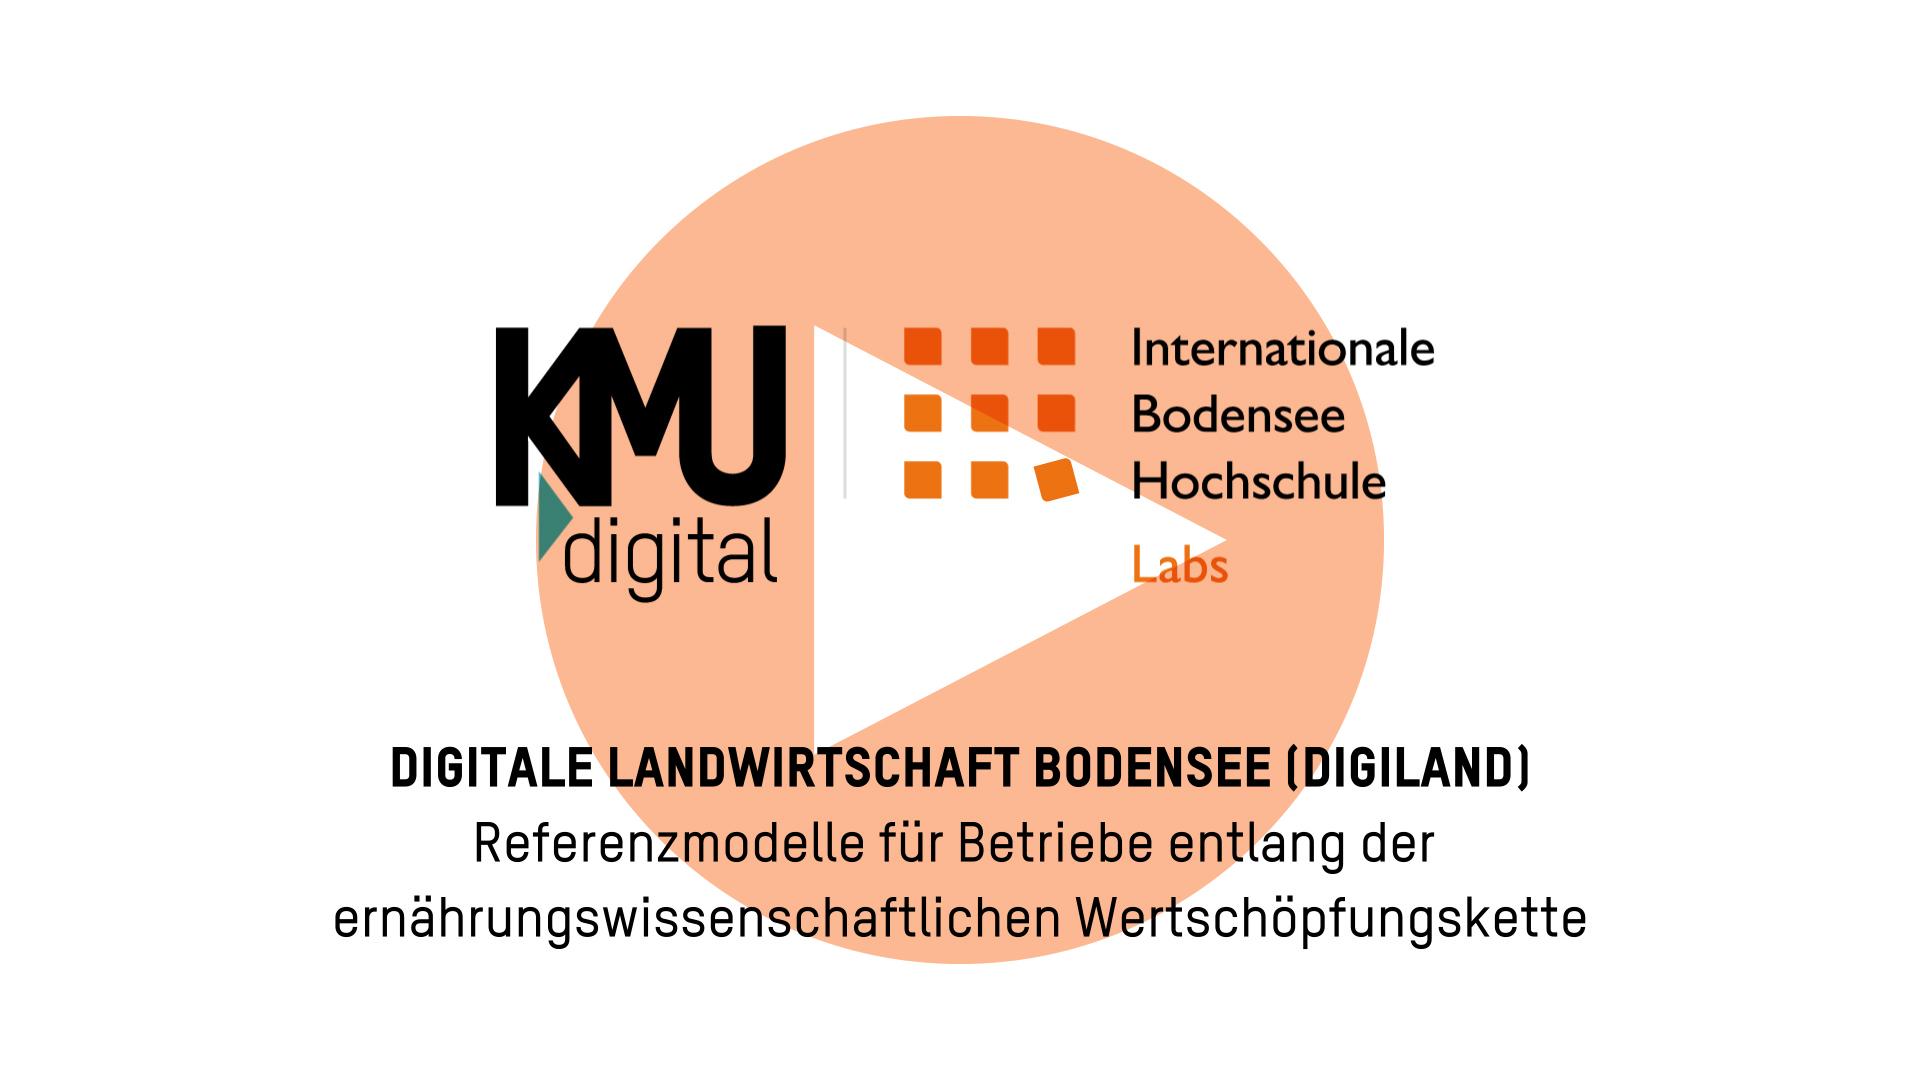 IBH-Lab KMUdigital DigiLand